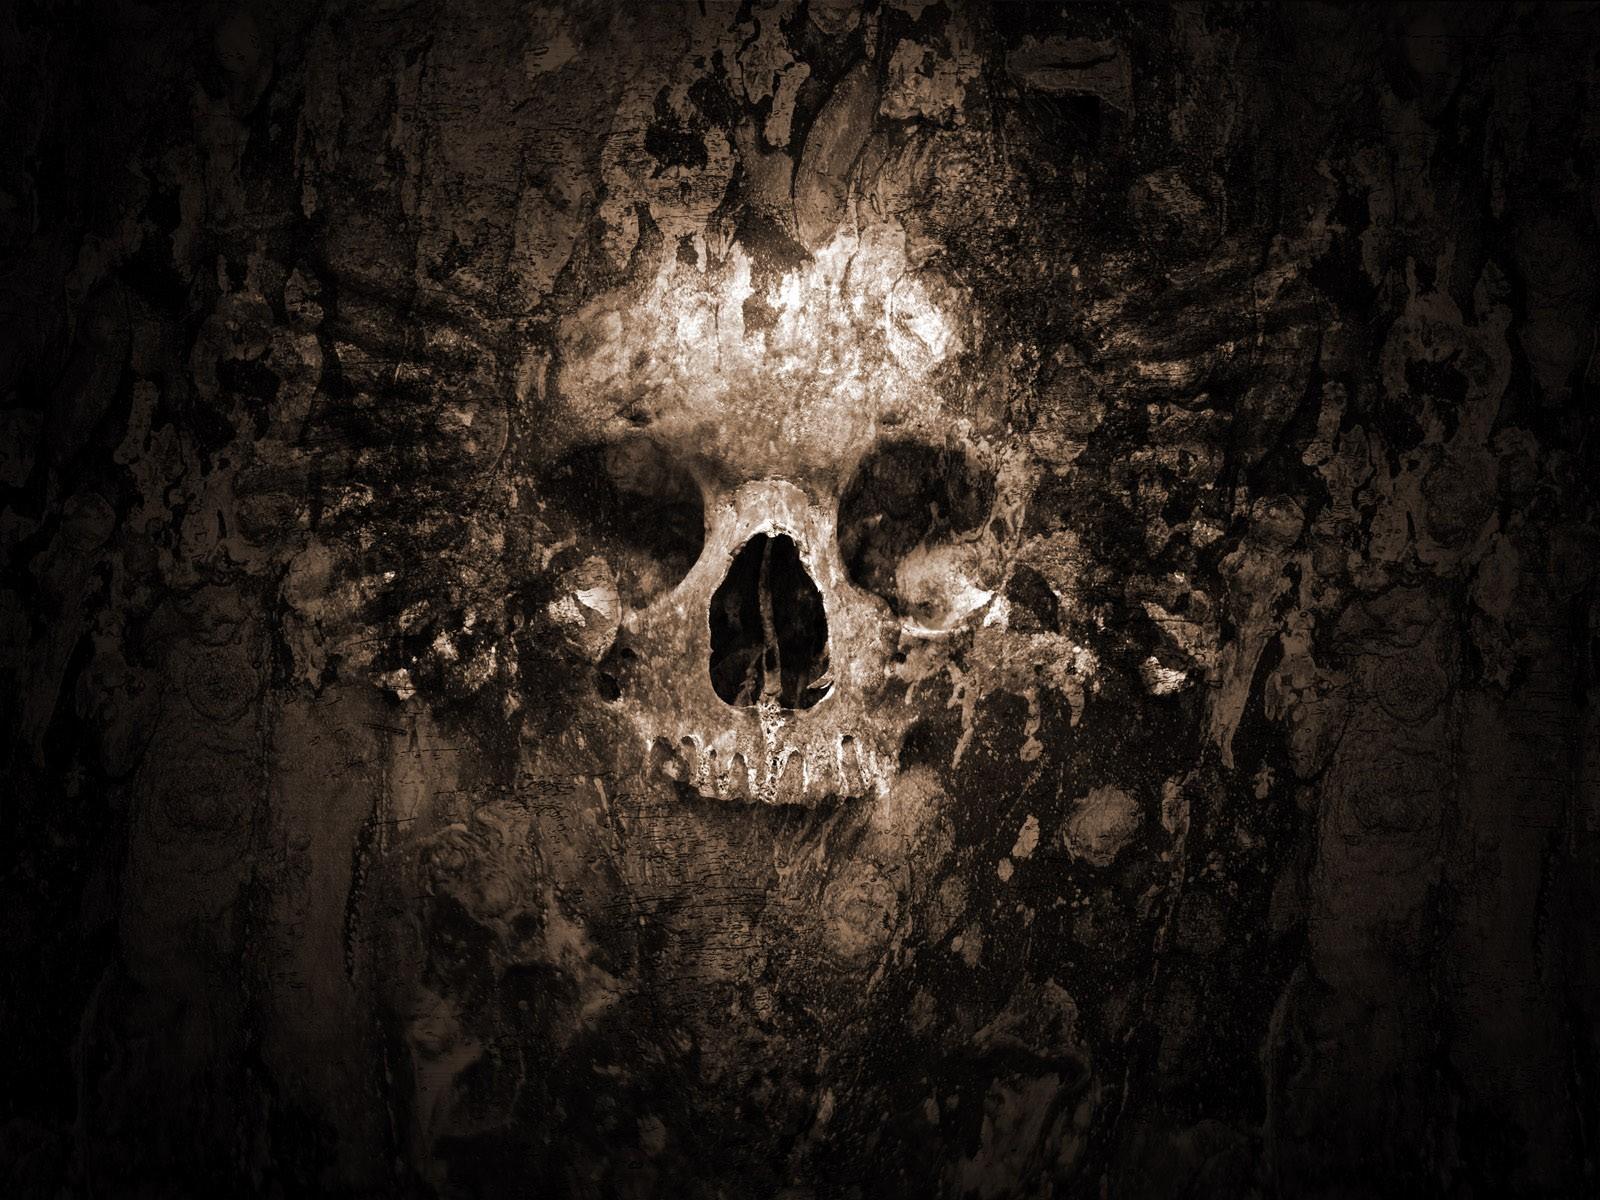 Gothic Skull wallpaper. Wallpapers 3d for desktop, 3d pictures